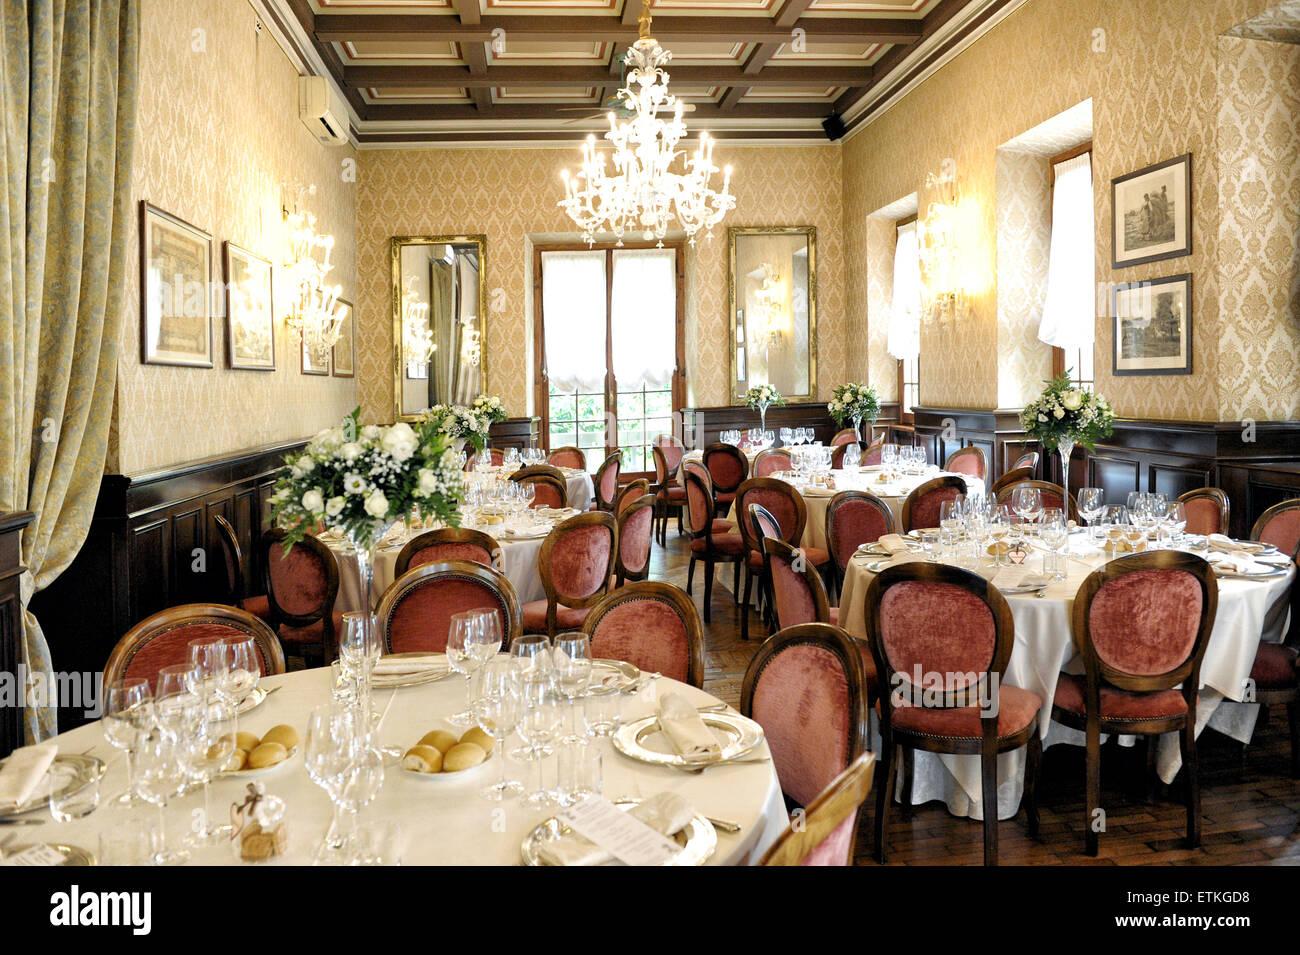 Elegant wedding venue interior with tables - Stock Image